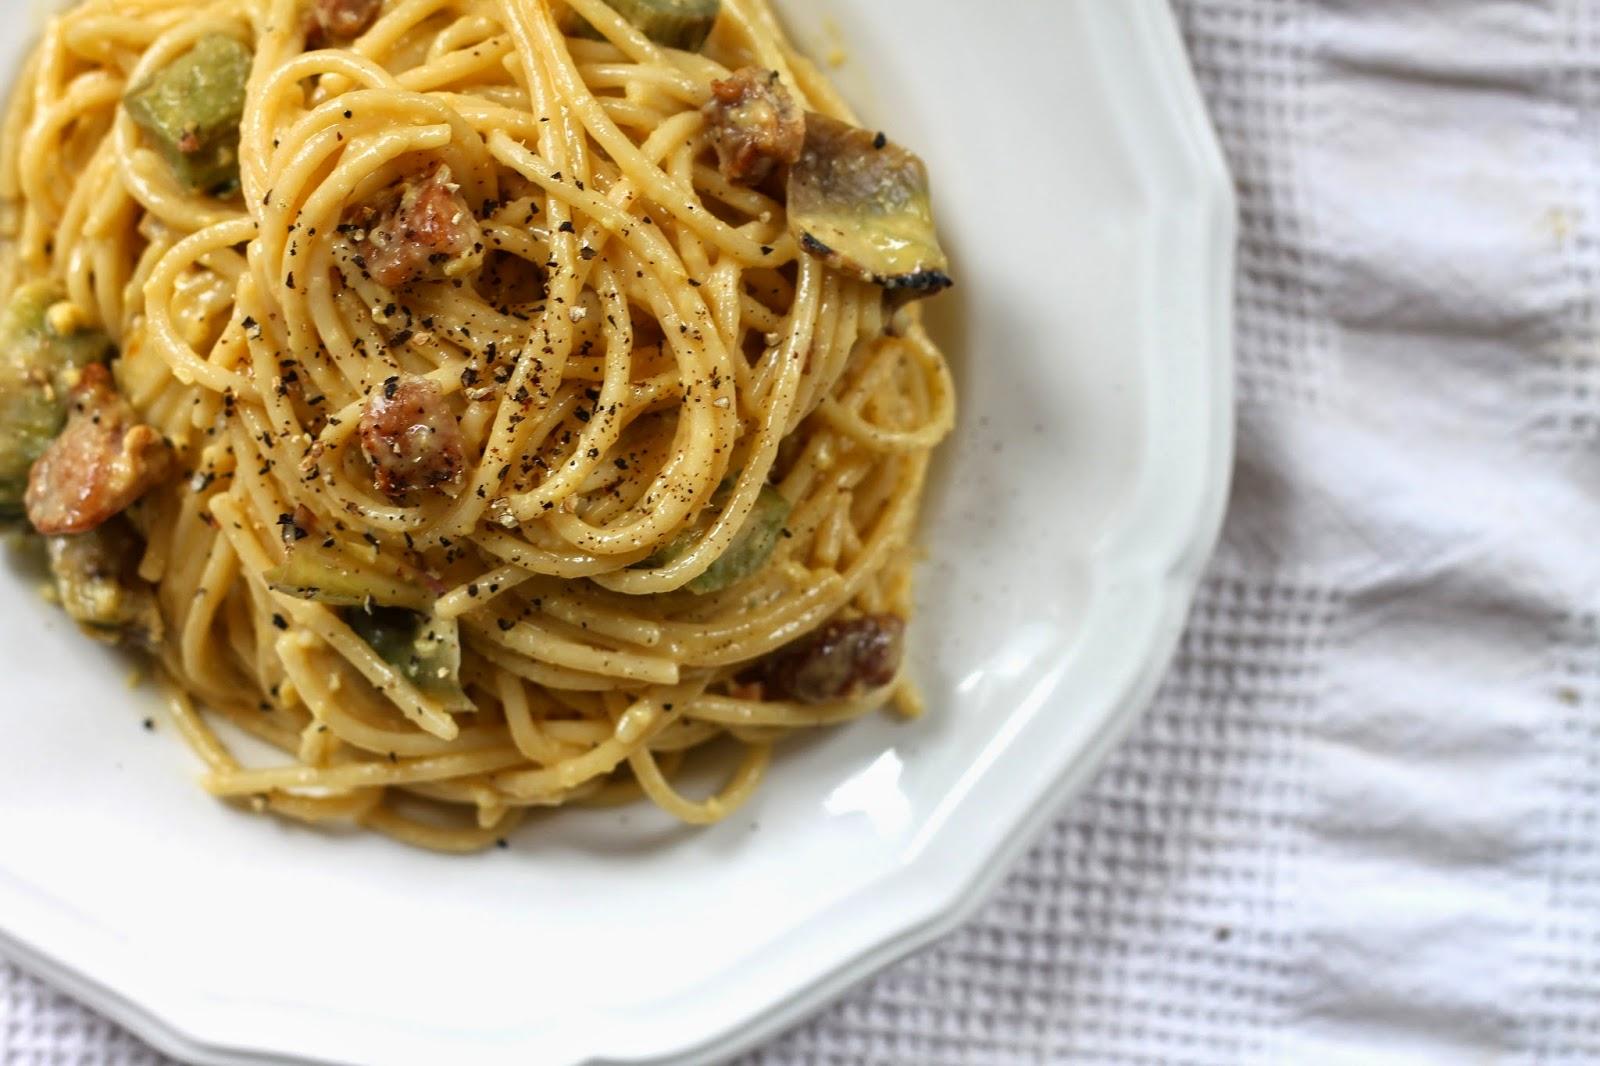 spaghetti alla carbonara di carciofi (spaghetti carbonara with artichoke)